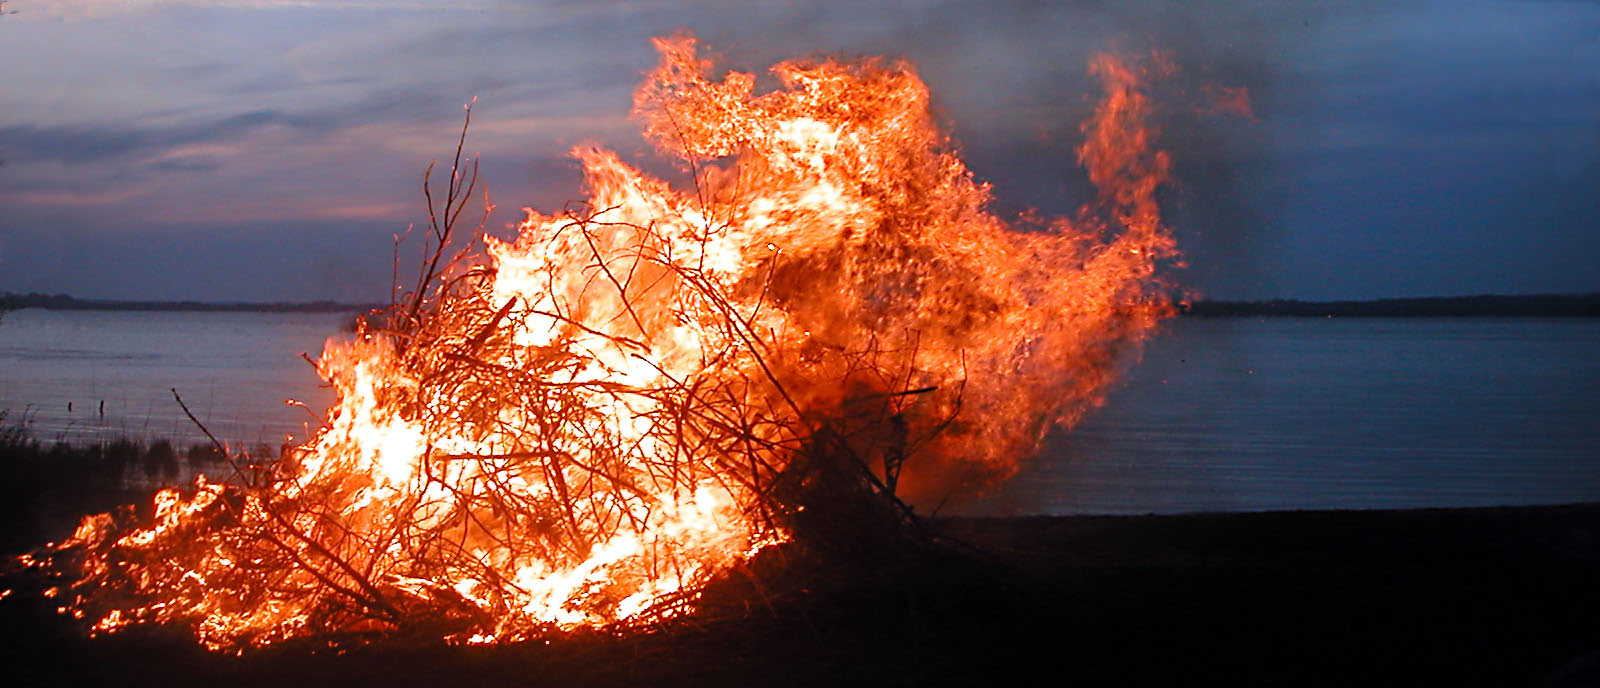 Walpurgis Night bonfire in Sweden